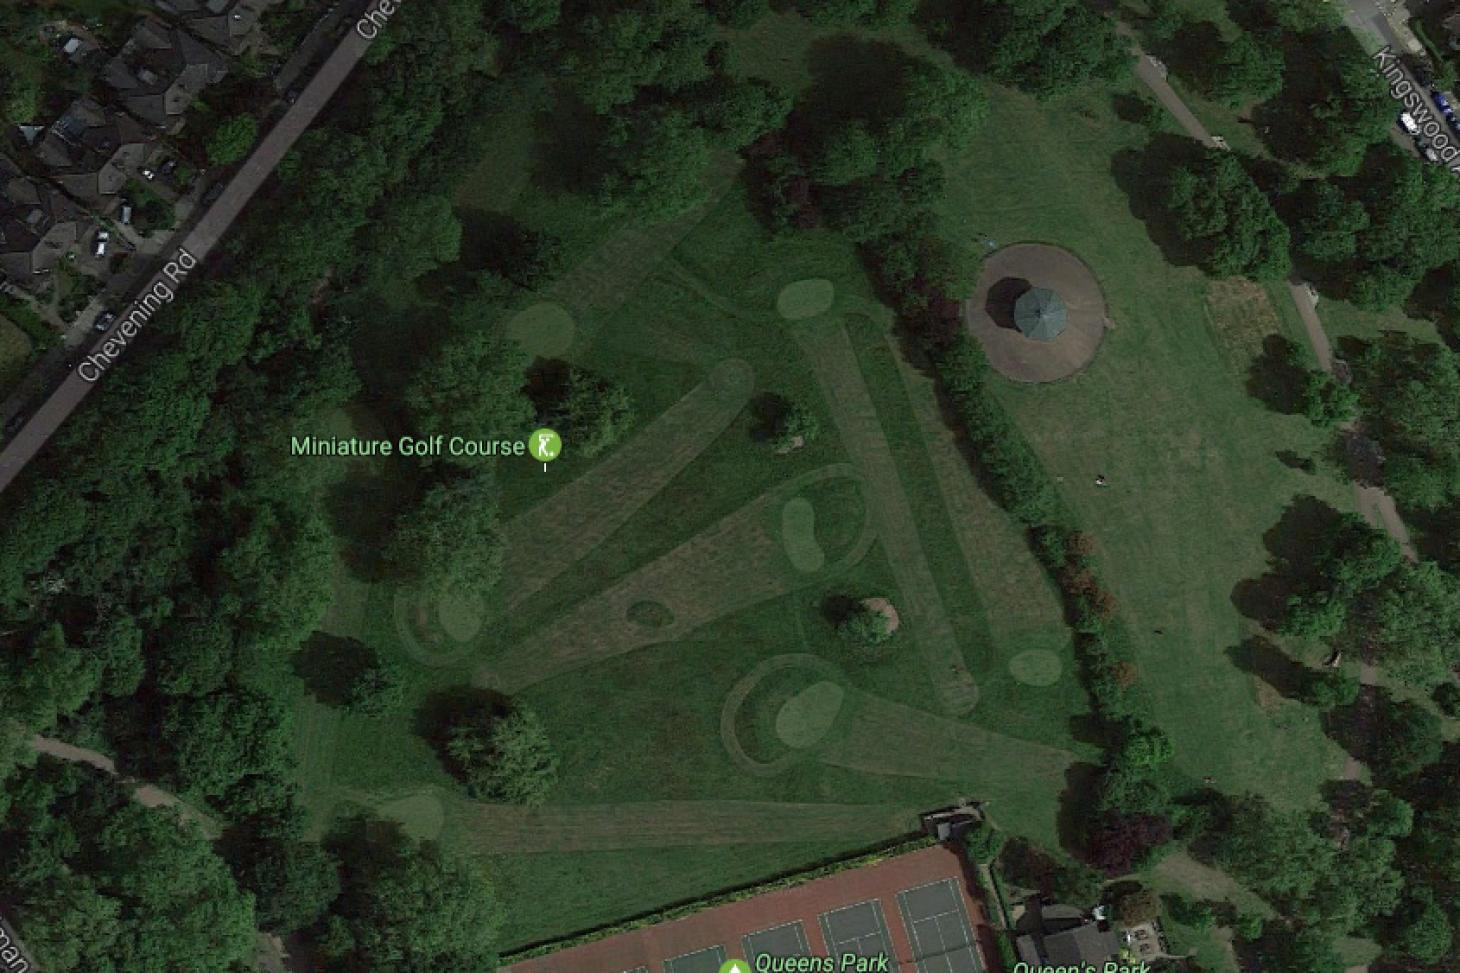 Queens Park 9 hole golf course